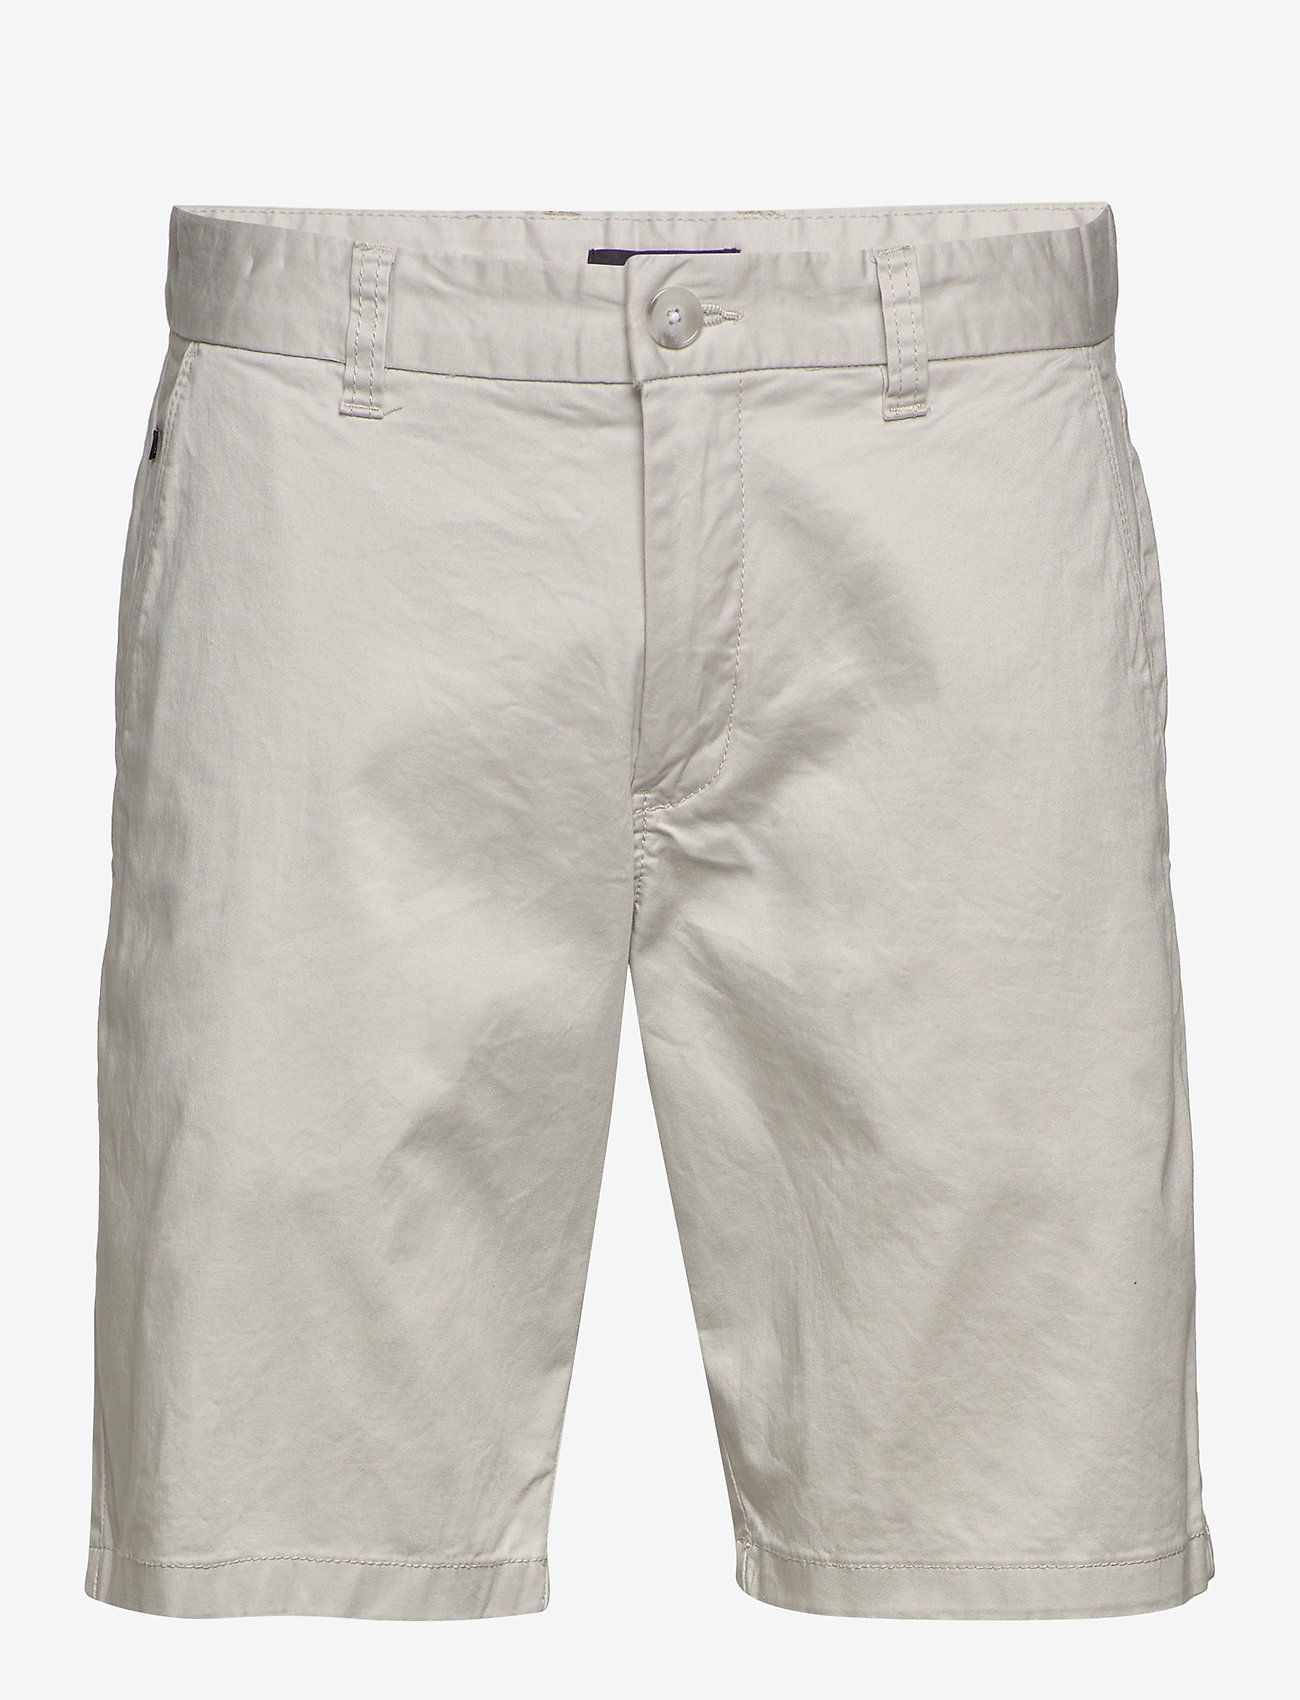 Matinique MApristu SH - Shorts LUNAR ROCK PVrH50G1